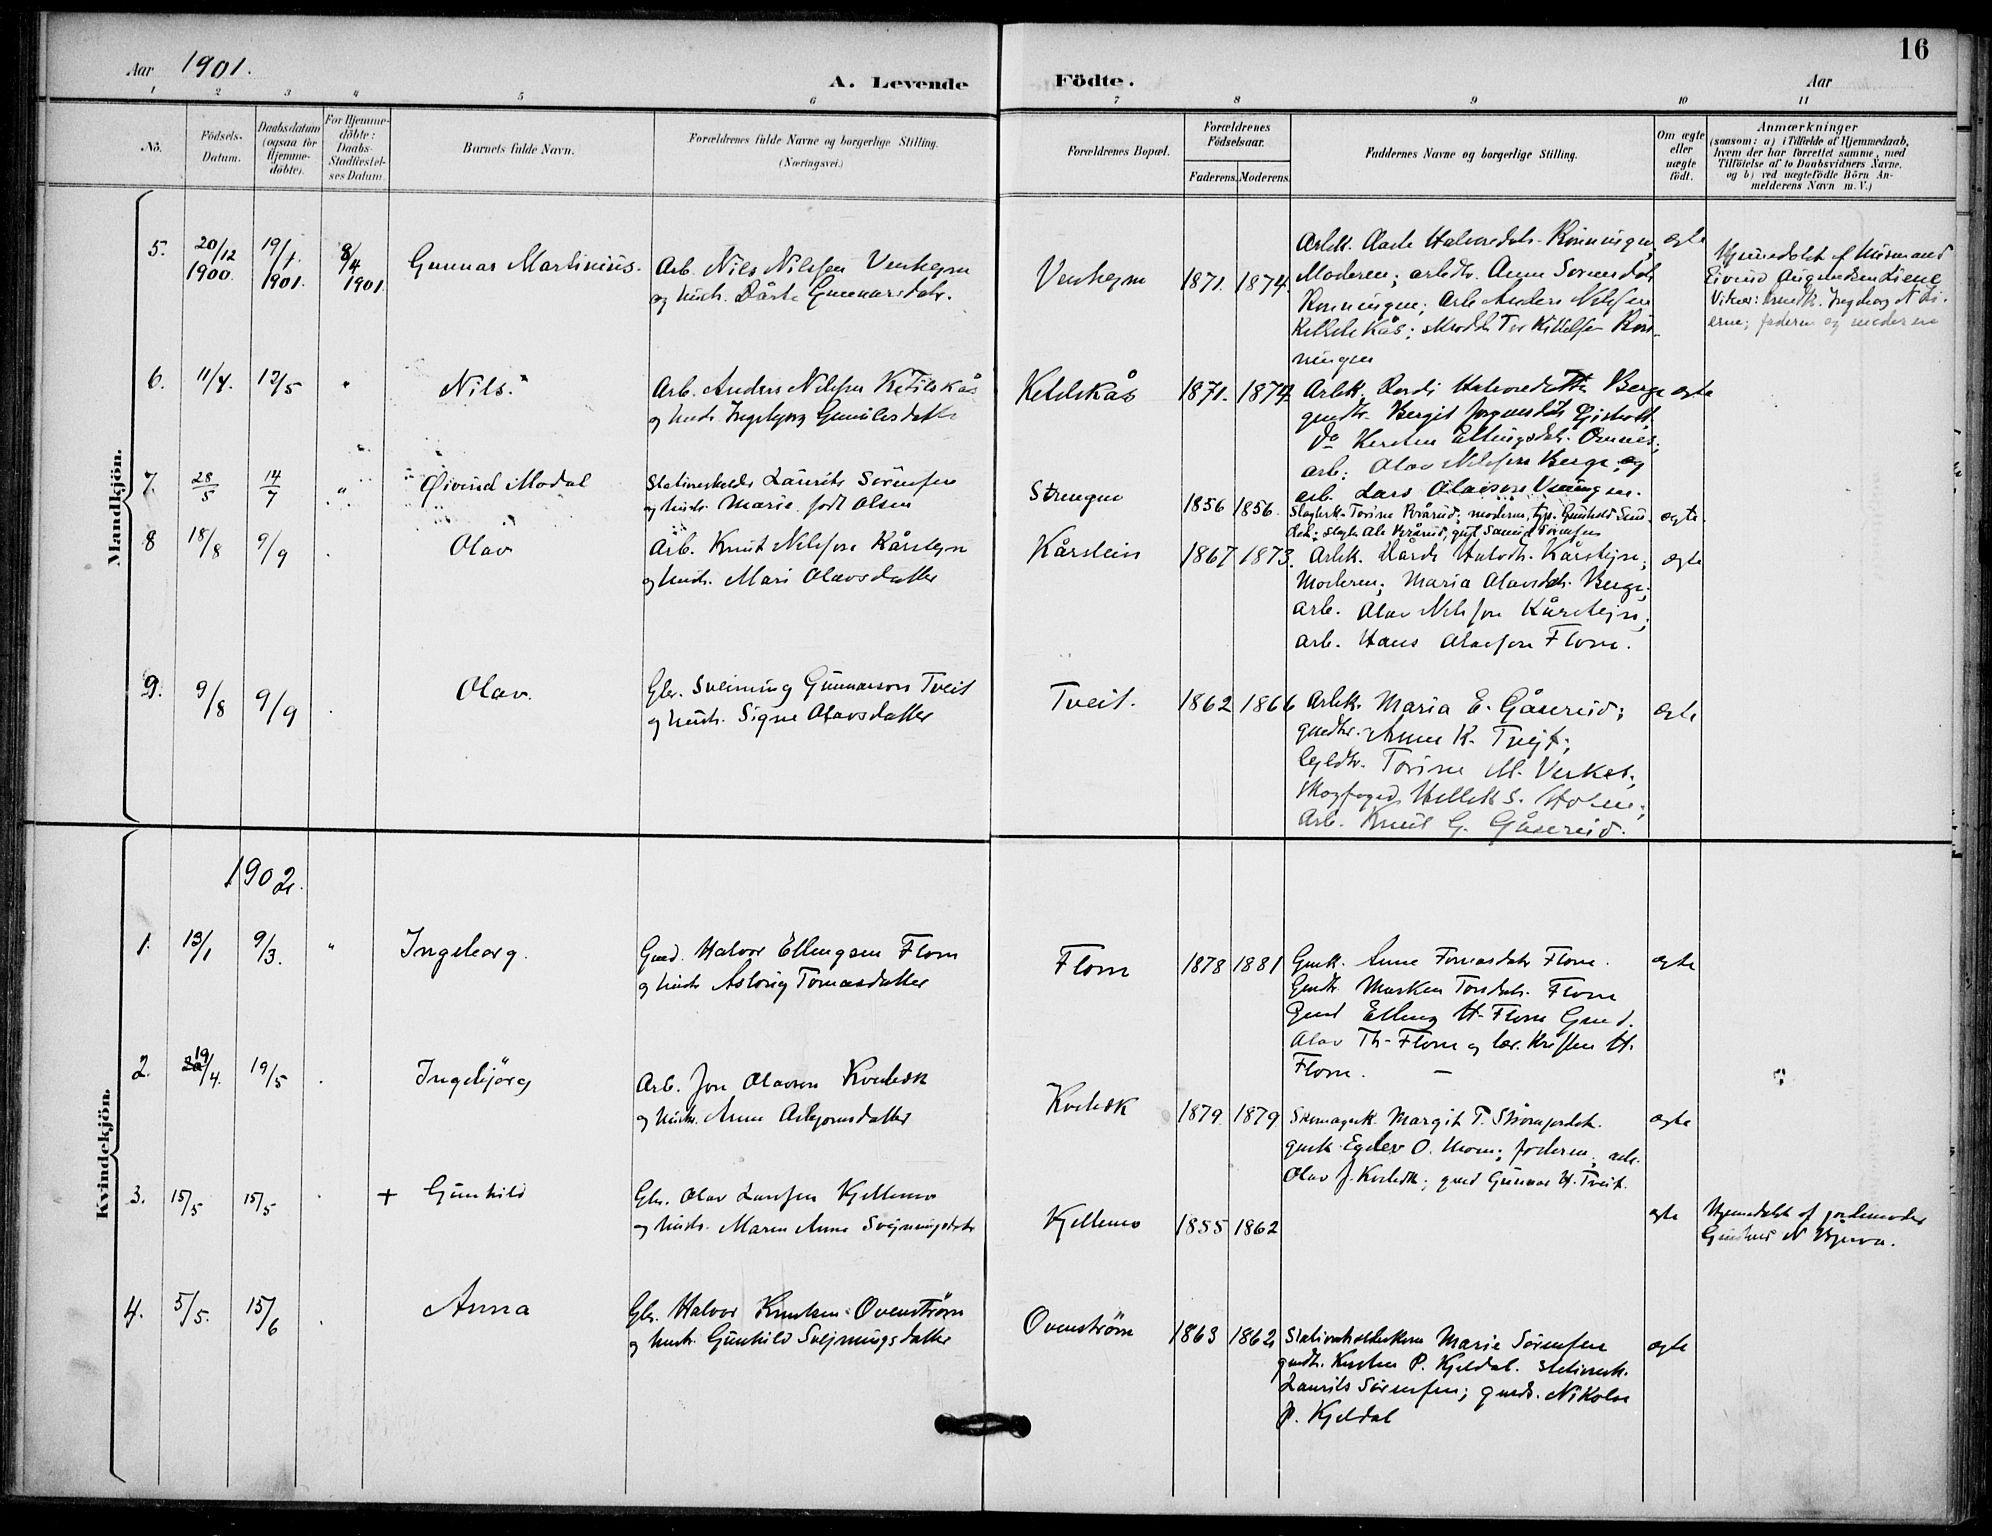 SAKO, Lunde kirkebøker, F/Fb/L0004: Ministerialbok nr. II 4, 1892-1907, s. 16